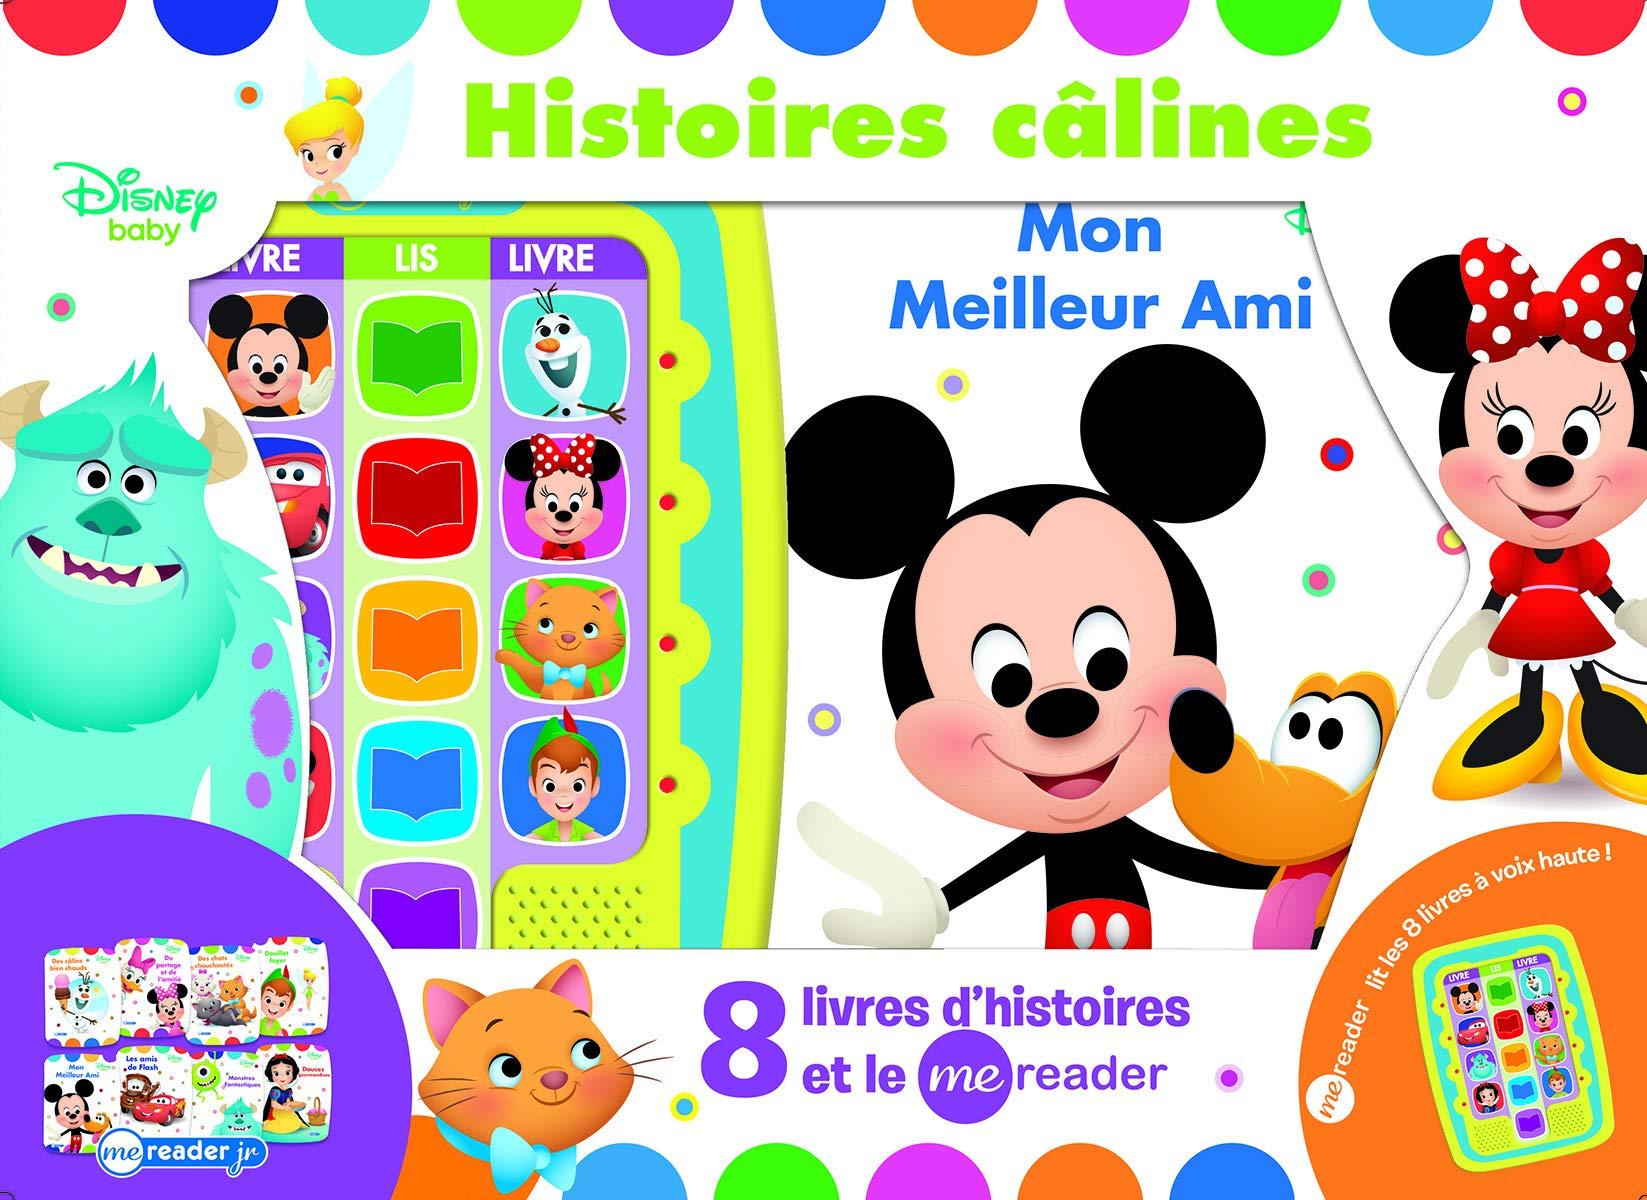 Coffret Histoires Calines Disney Baby 8 Livres D Histoires